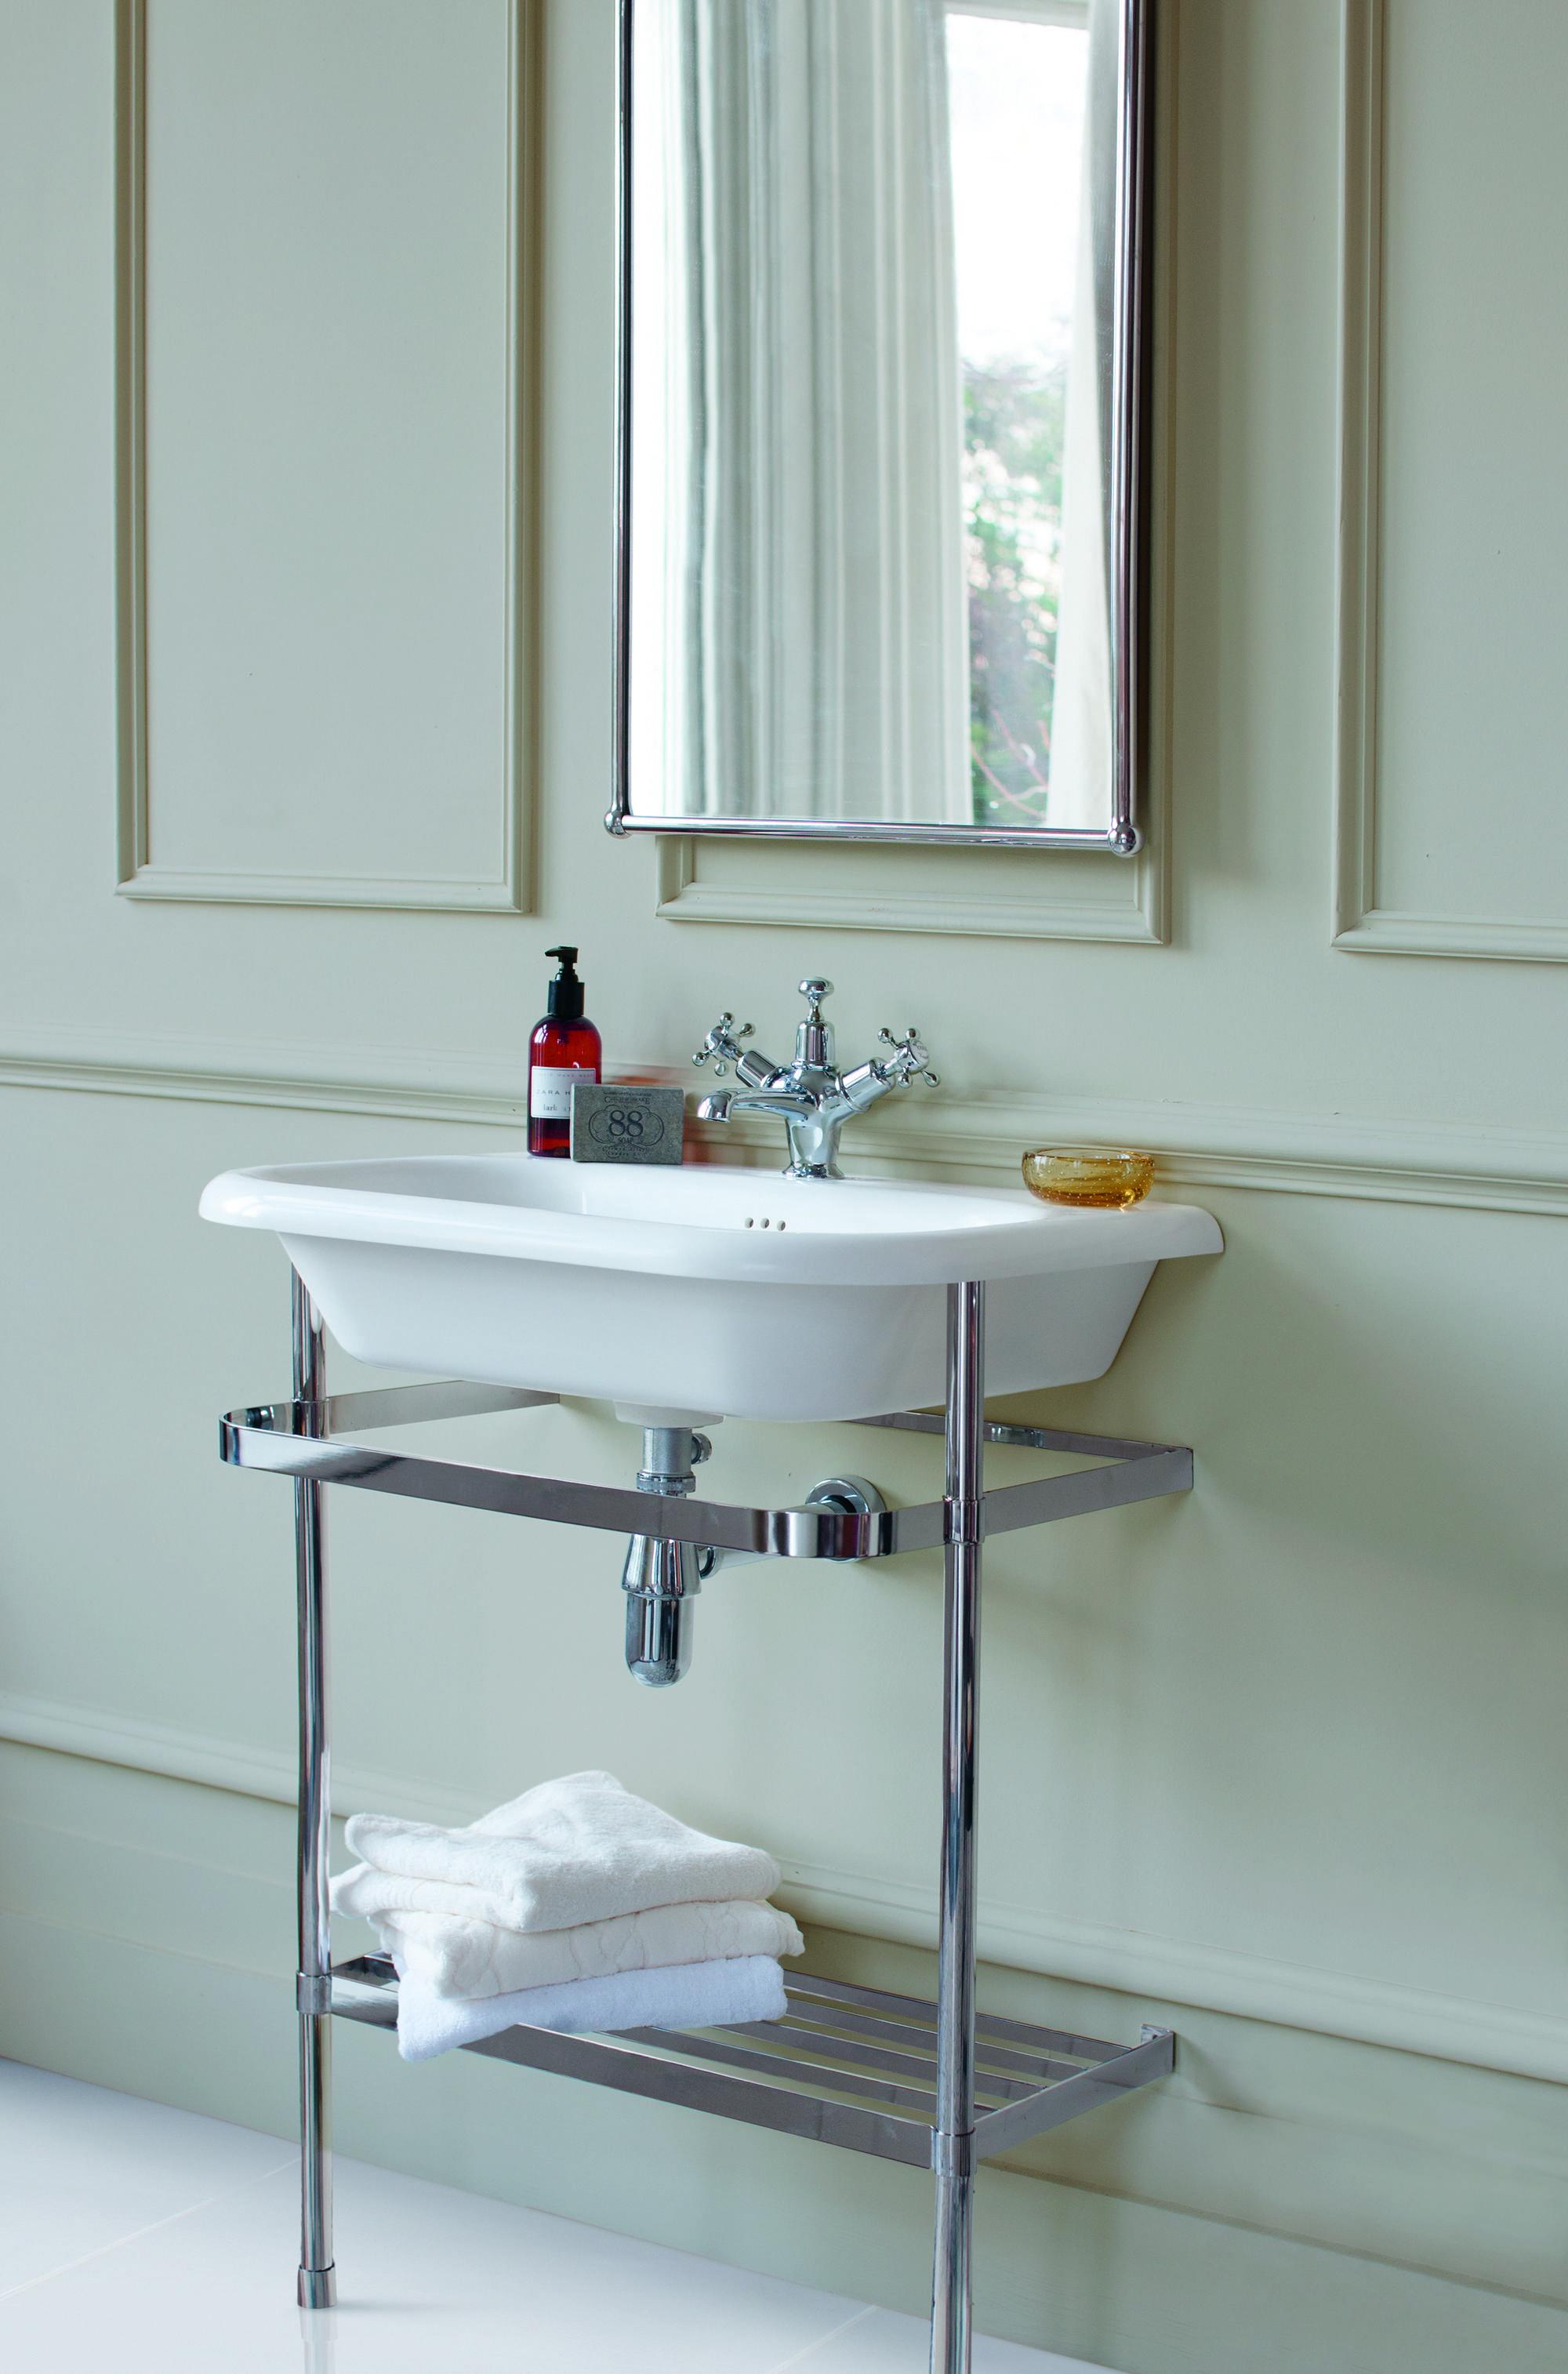 White Sink With Chrome Towel Rail